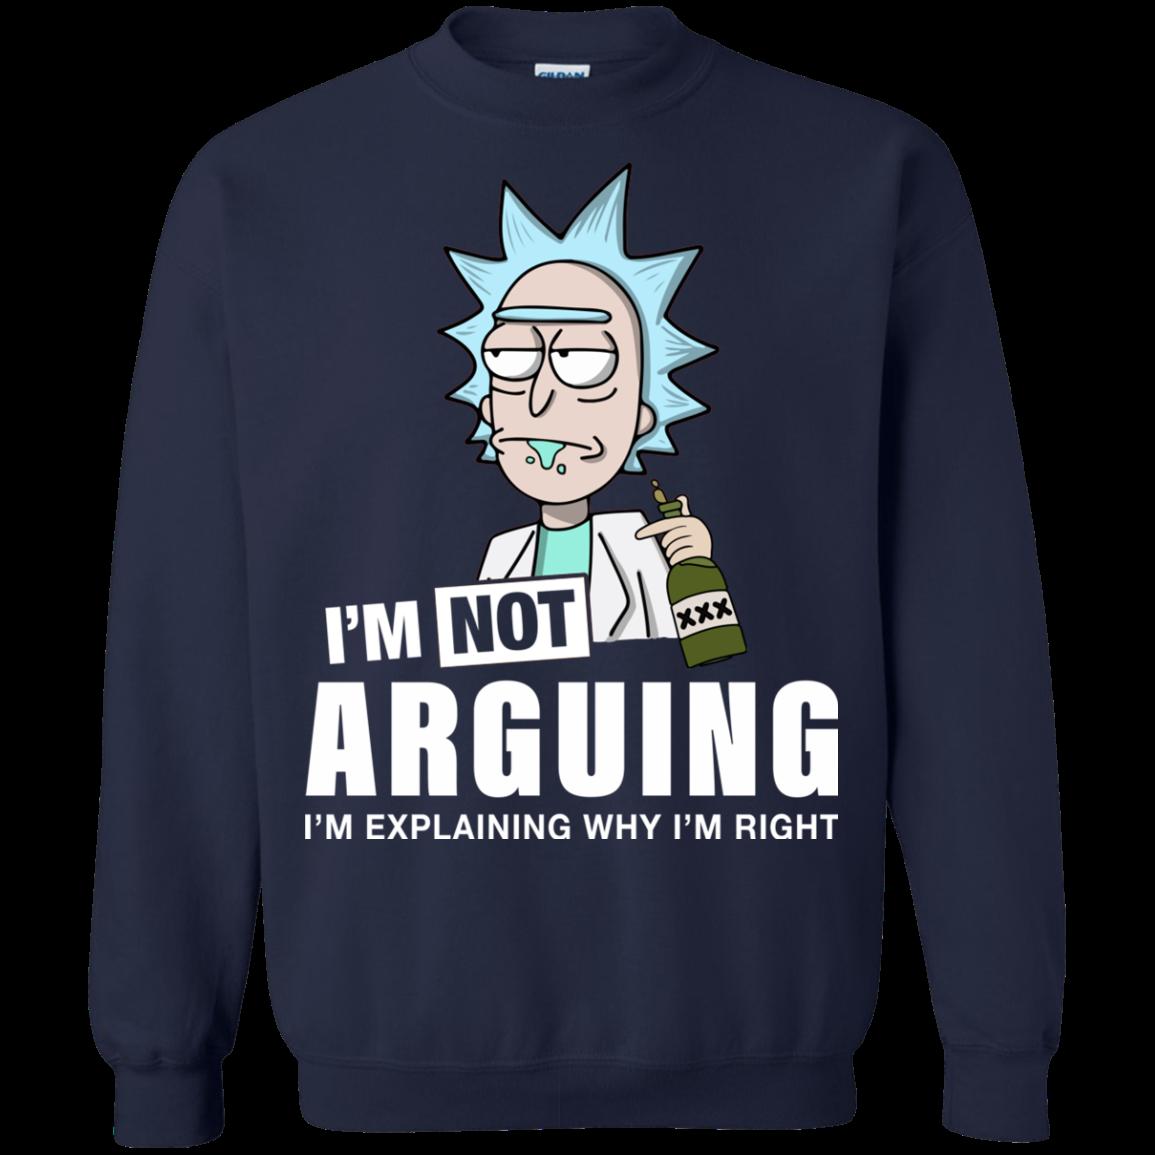 55d4a84fb48a Rick and Morty: I'm not arguing I'm explaining shirt, hoodie, tank ...